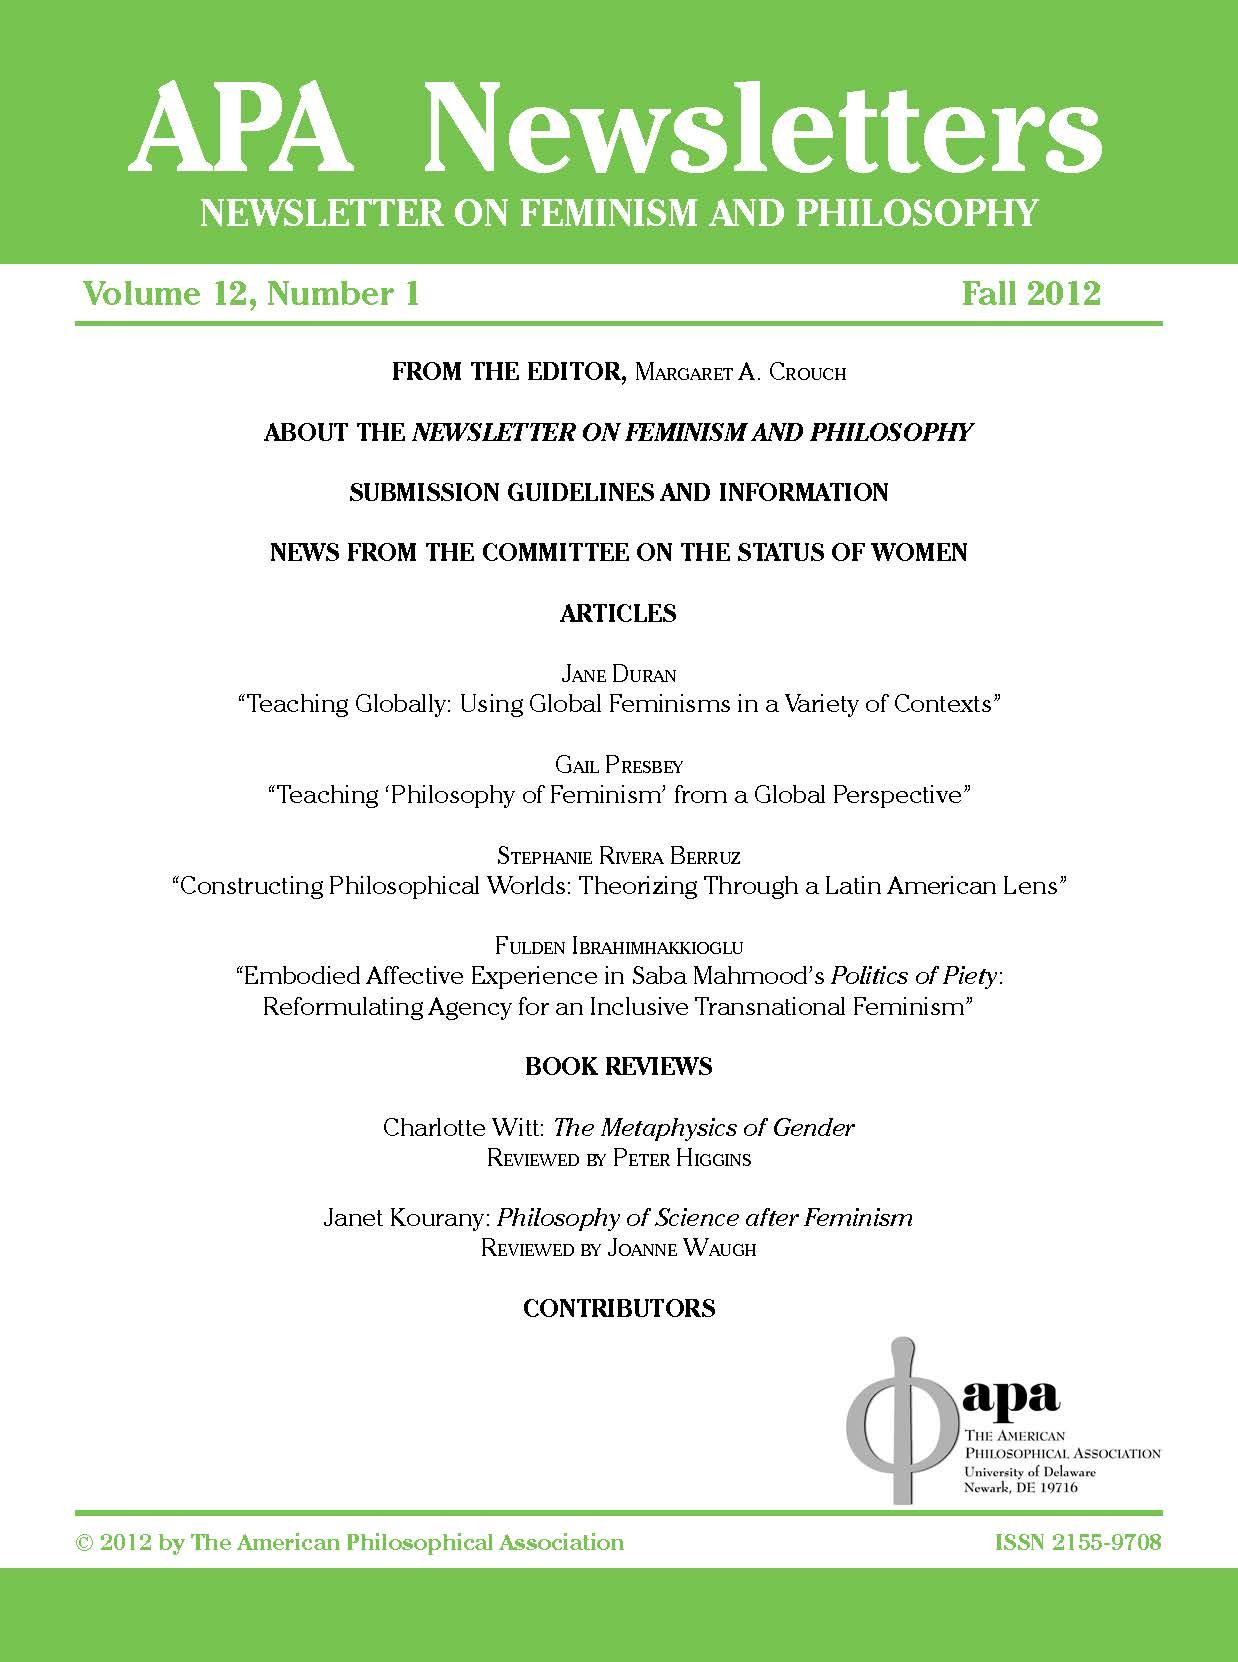 fulden ibrahimhakkioglu publishes article in the fall 2012 apa